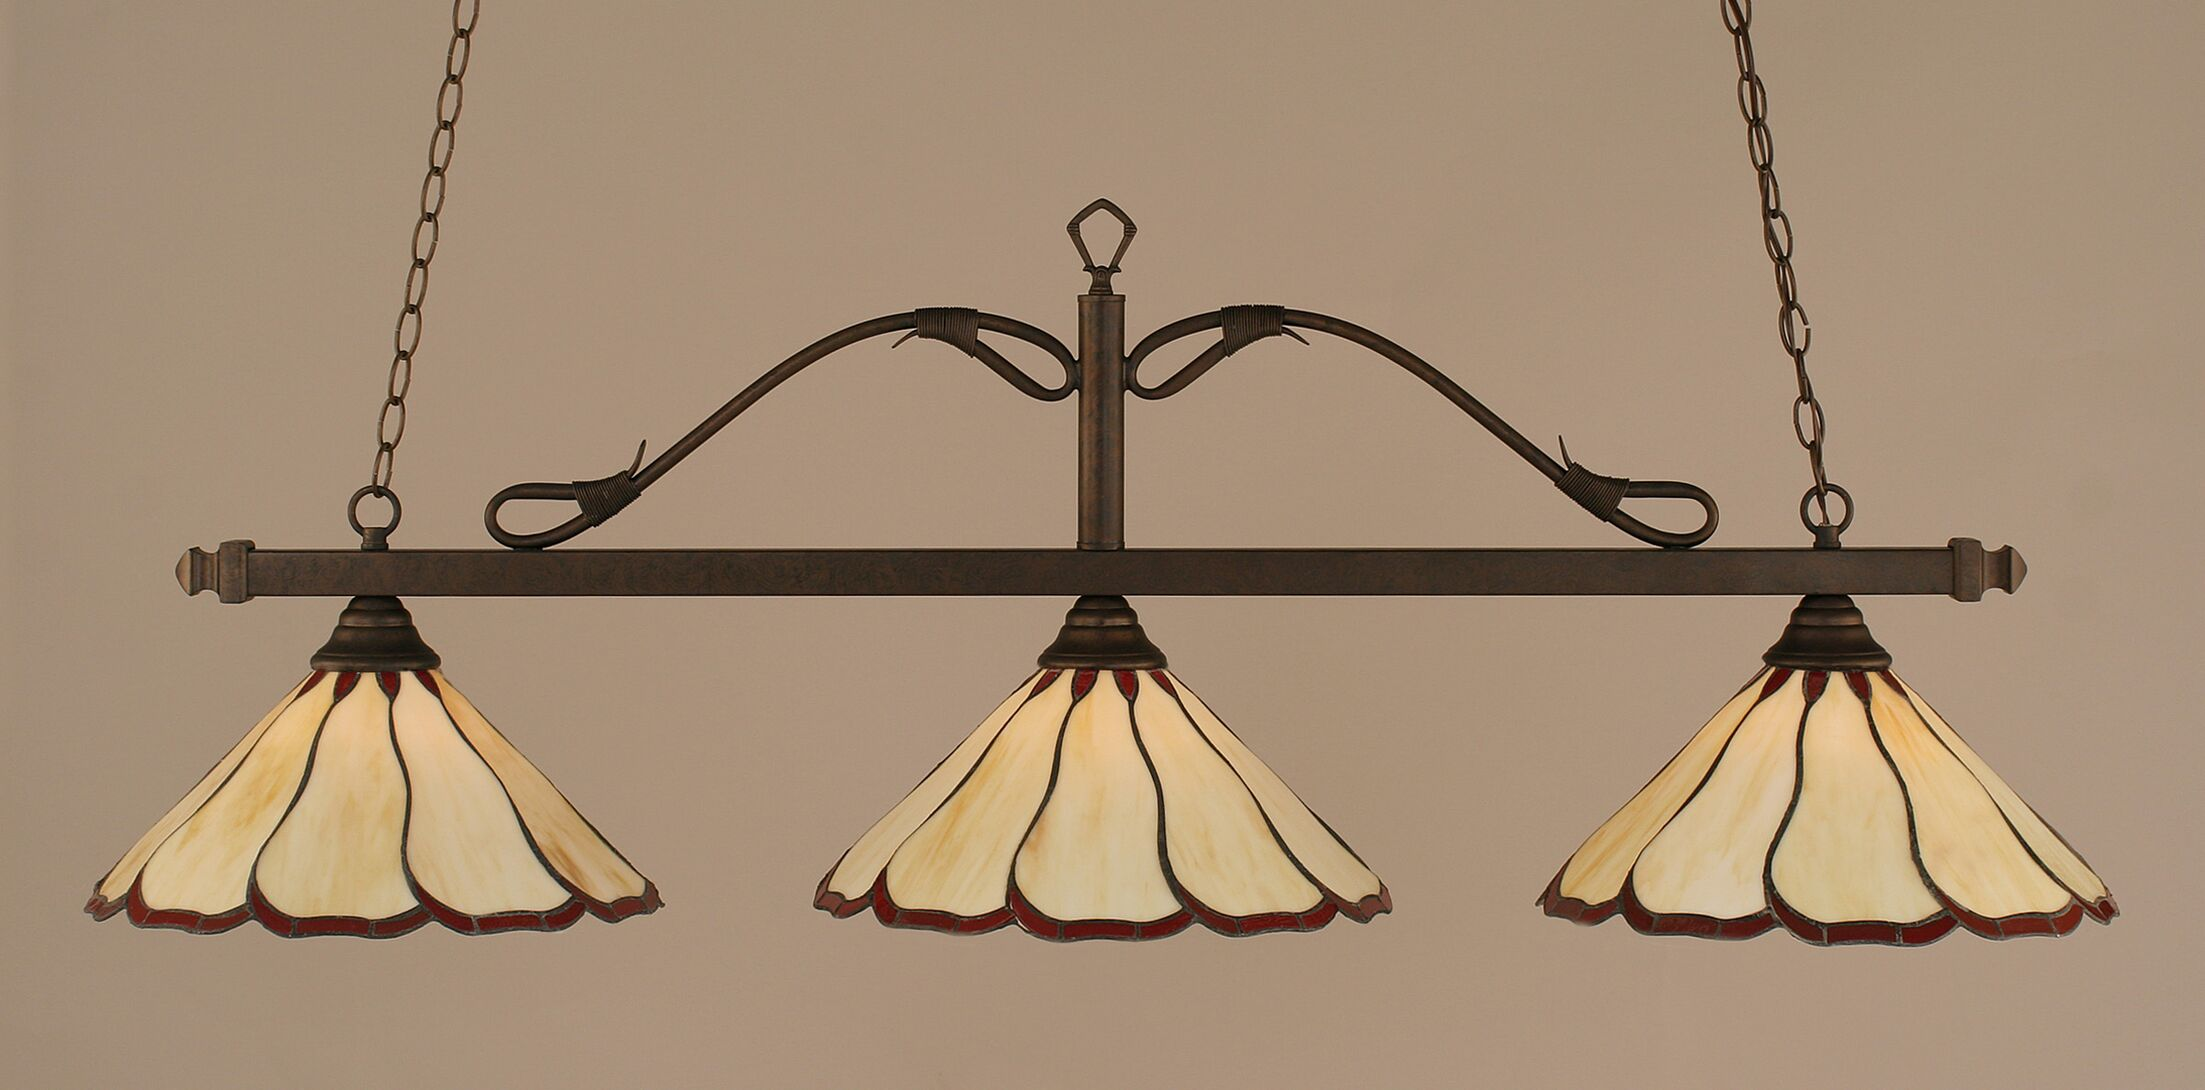 Reba 3-Light Billiard Light Color: Bronze, Shade: 16